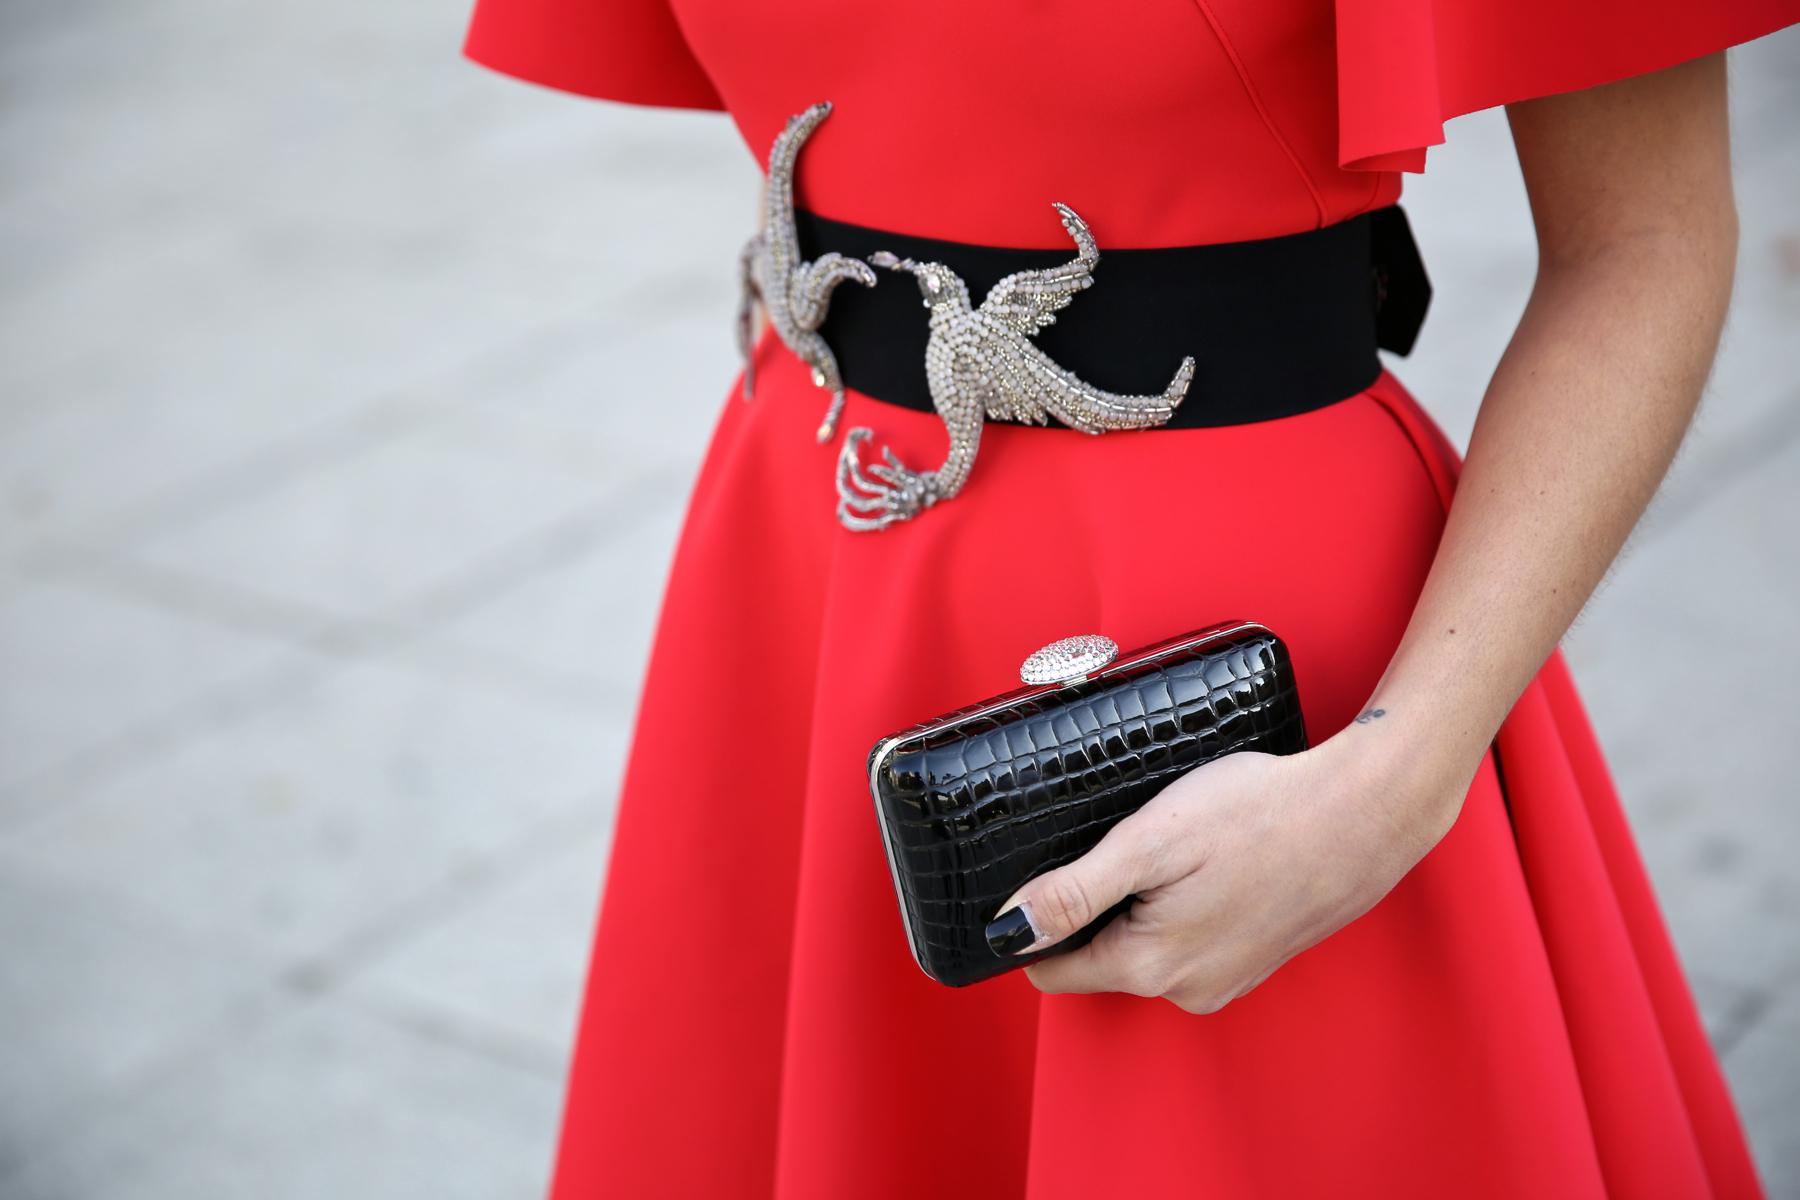 trendy_taste-look-outfit-street_style-ootd-blog-blogger-fashion_spain-moda_españa-vestido_fiesta-24fab-3